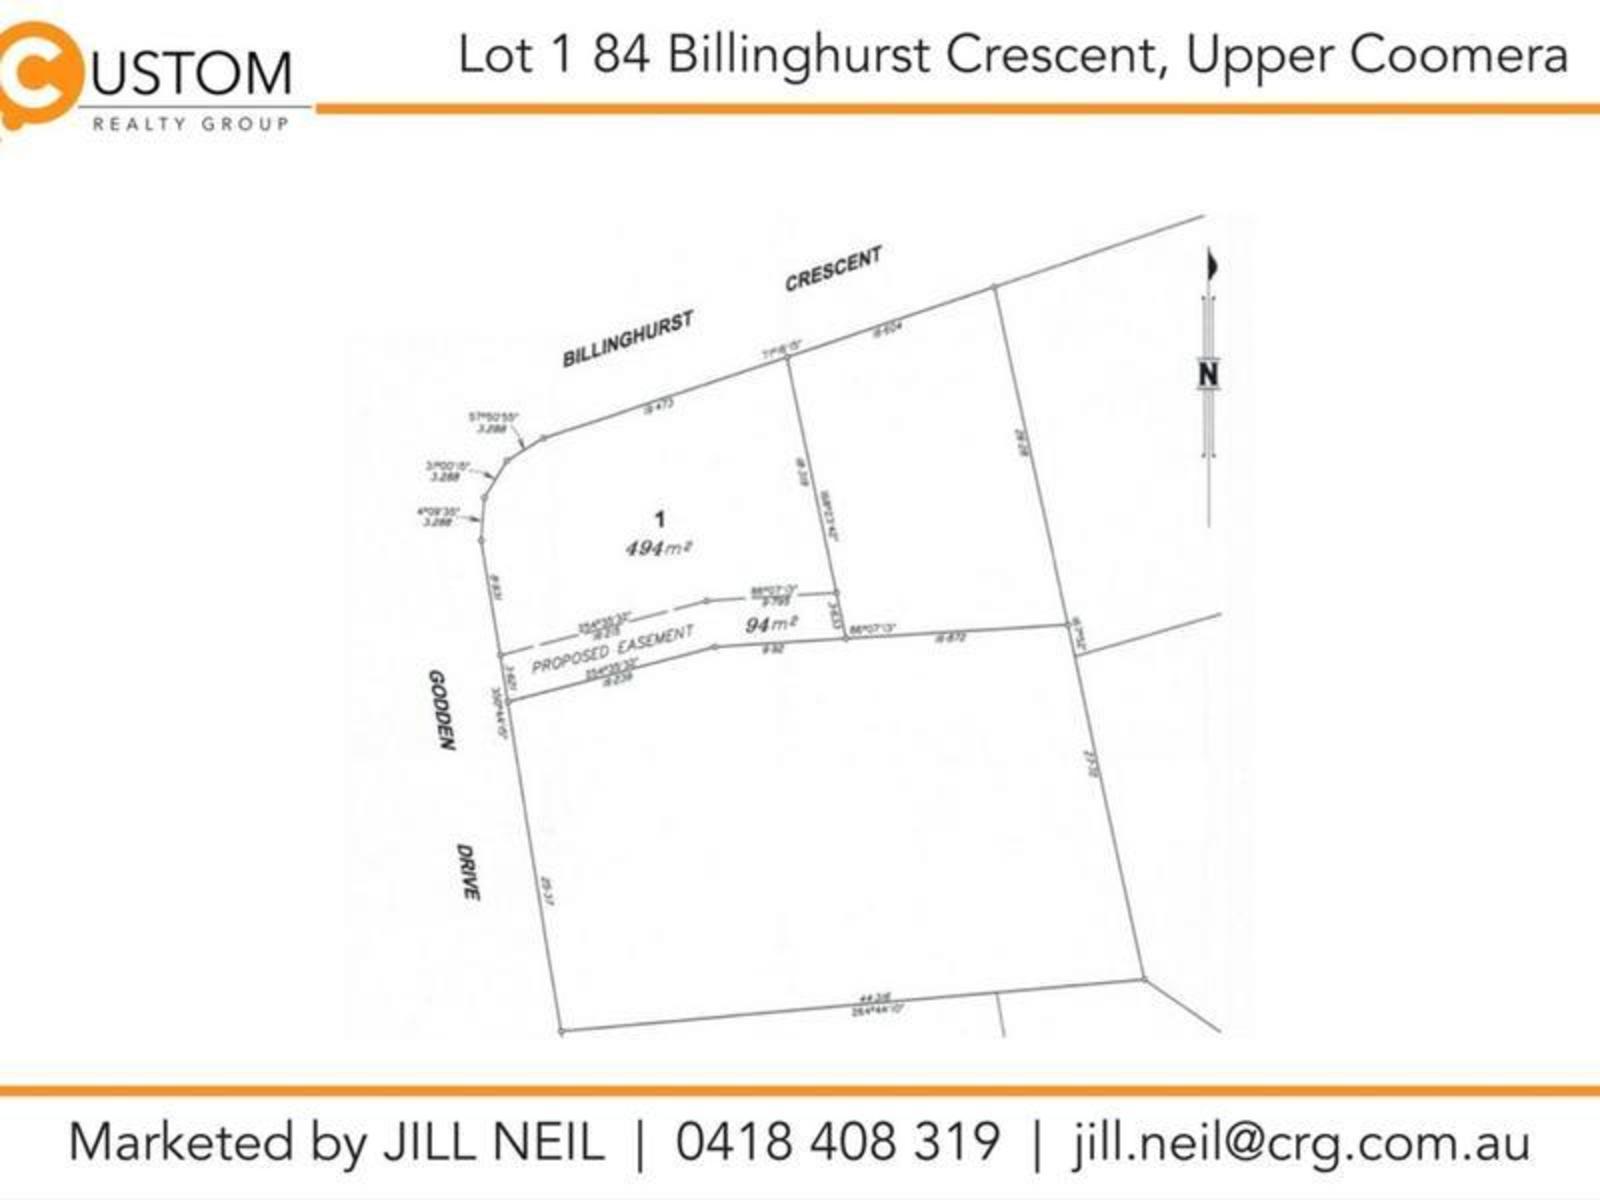 Lot 1, 84 Billinghurst Crescent, Upper Coomera